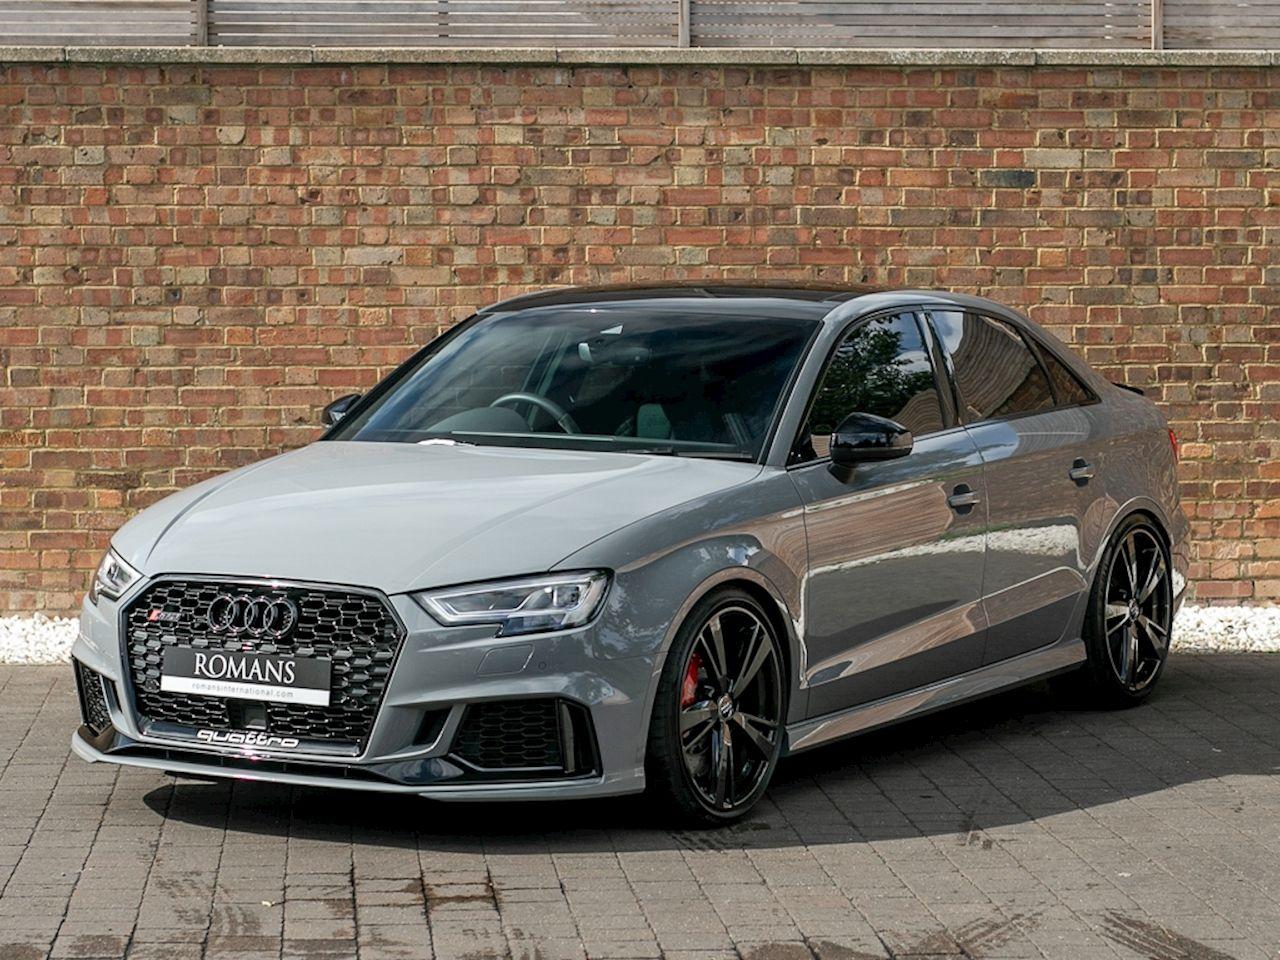 2017 Used Audi A3 Rs 3 Quattro | Nardo Grey | Audi, Audi ...